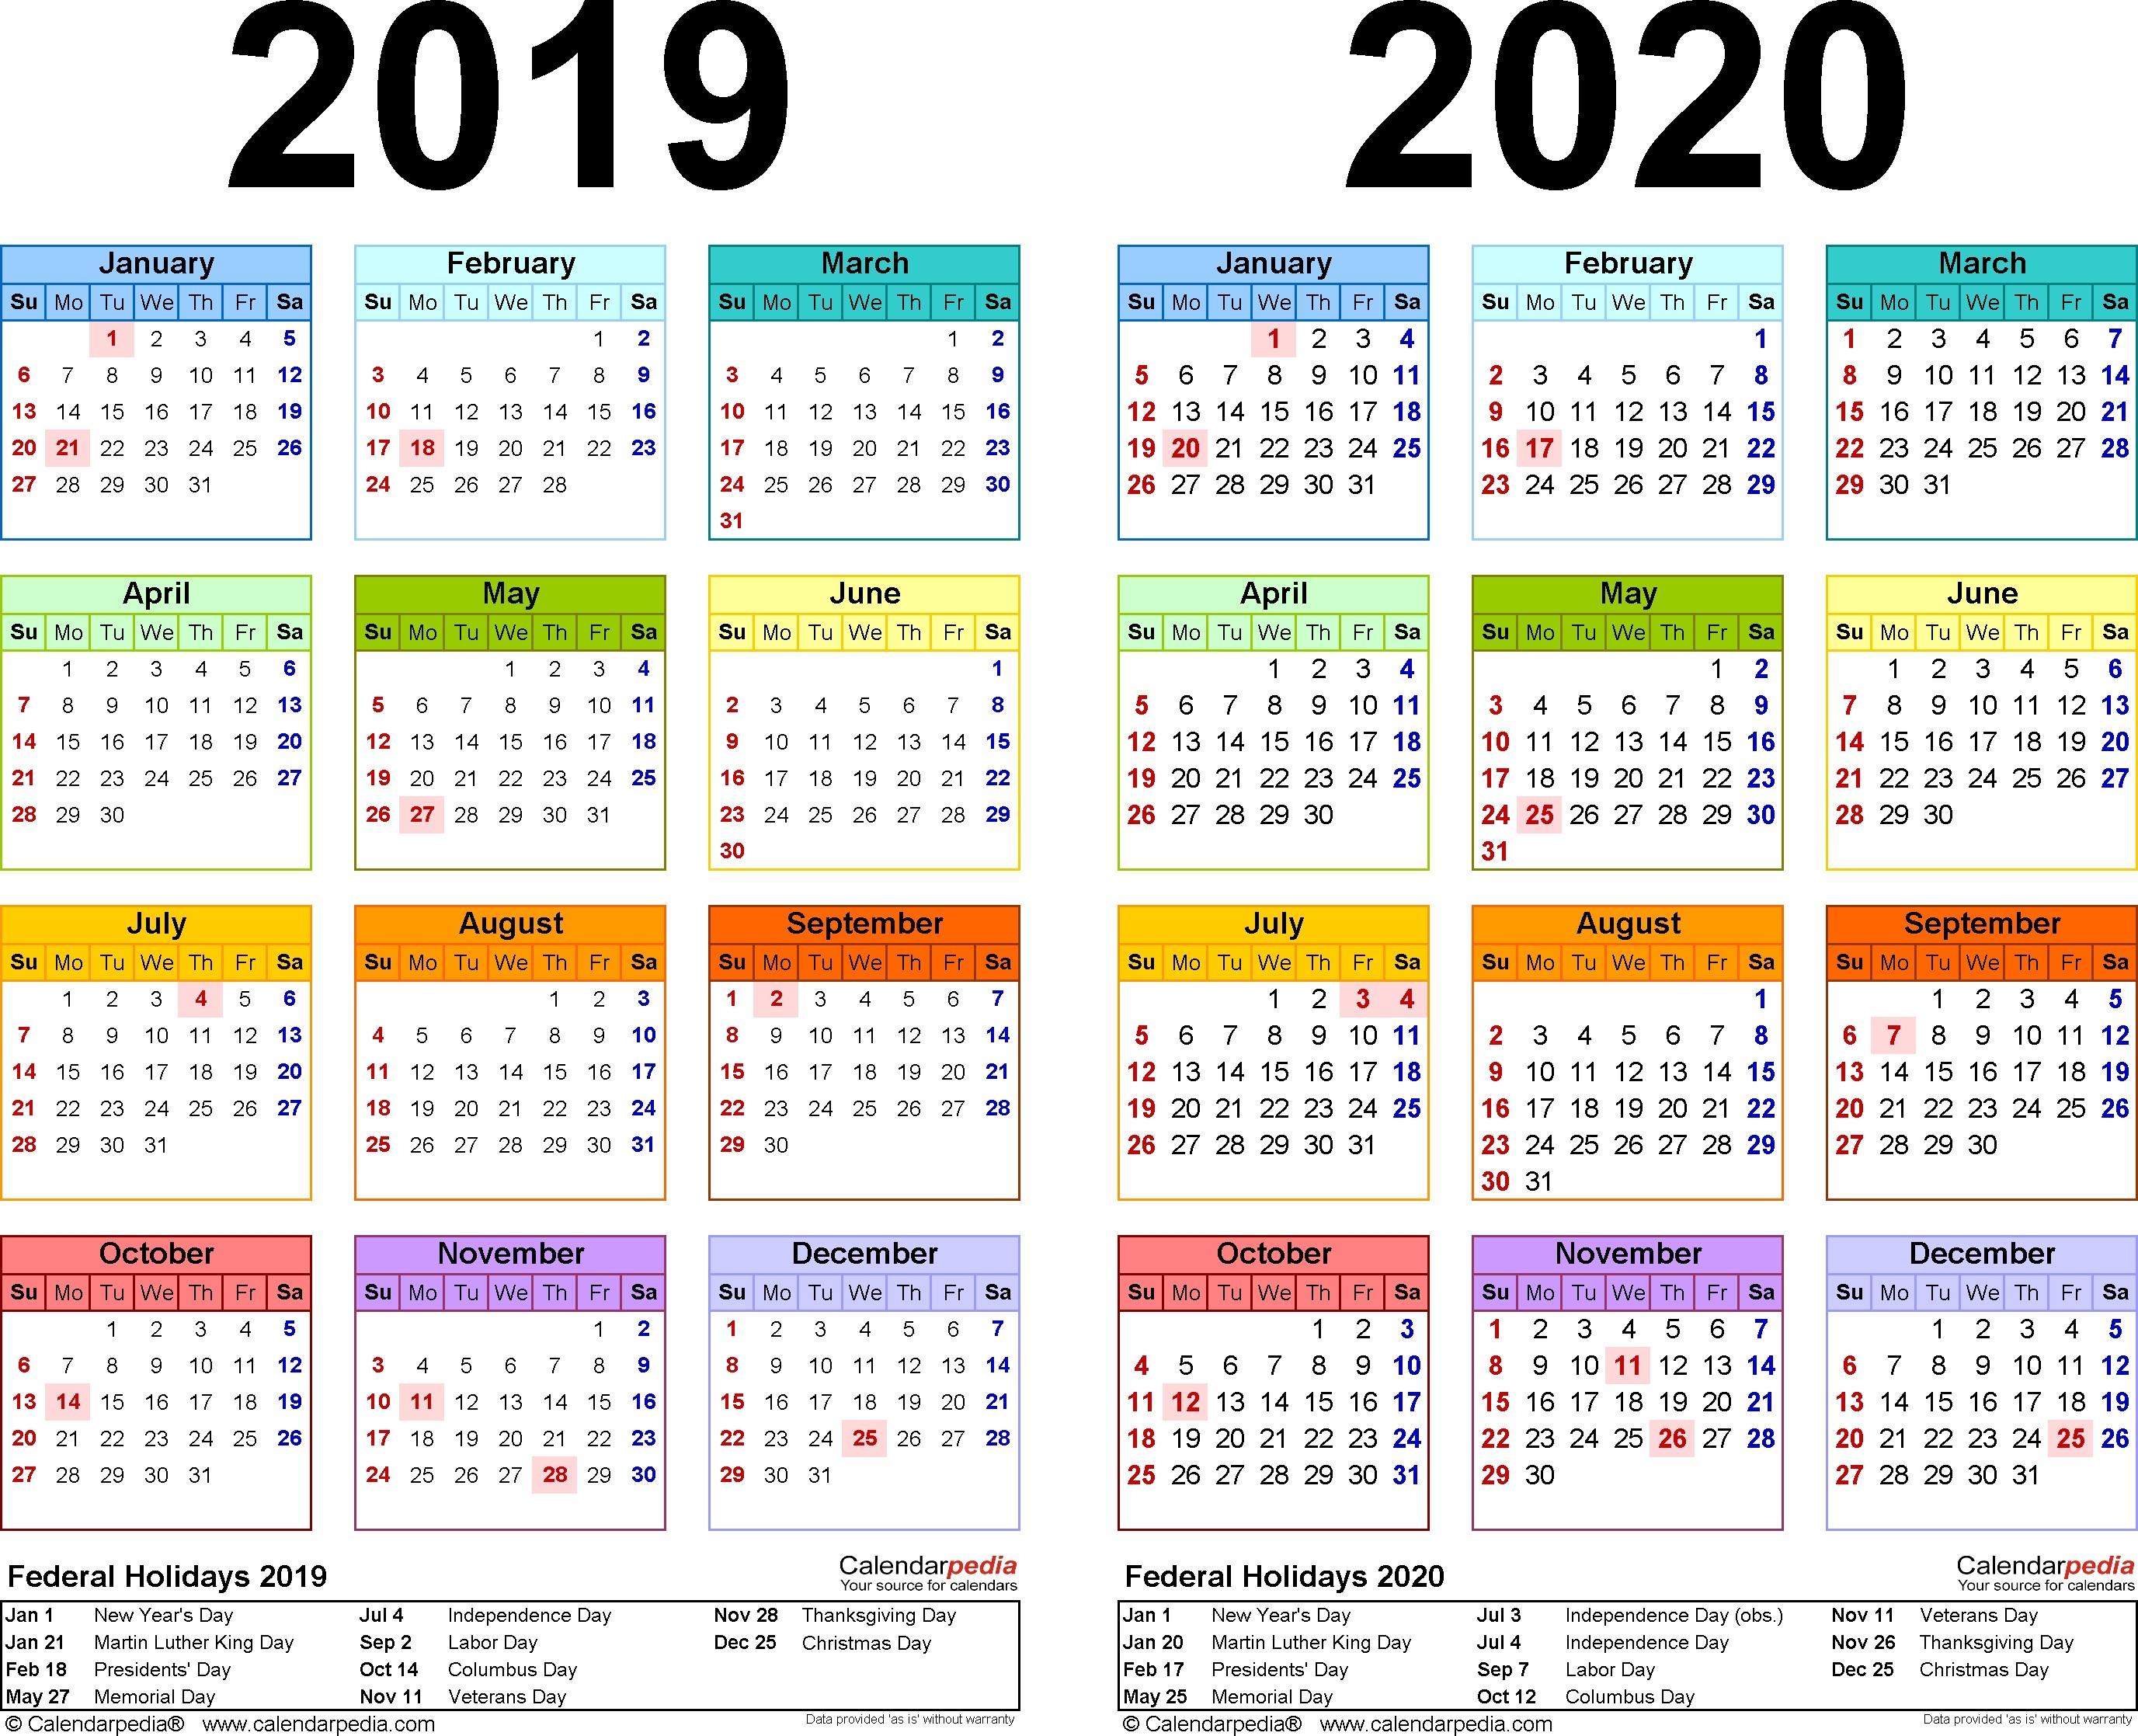 Free Download 2020 Calendar With Holidays Trinidad - Kemutsu